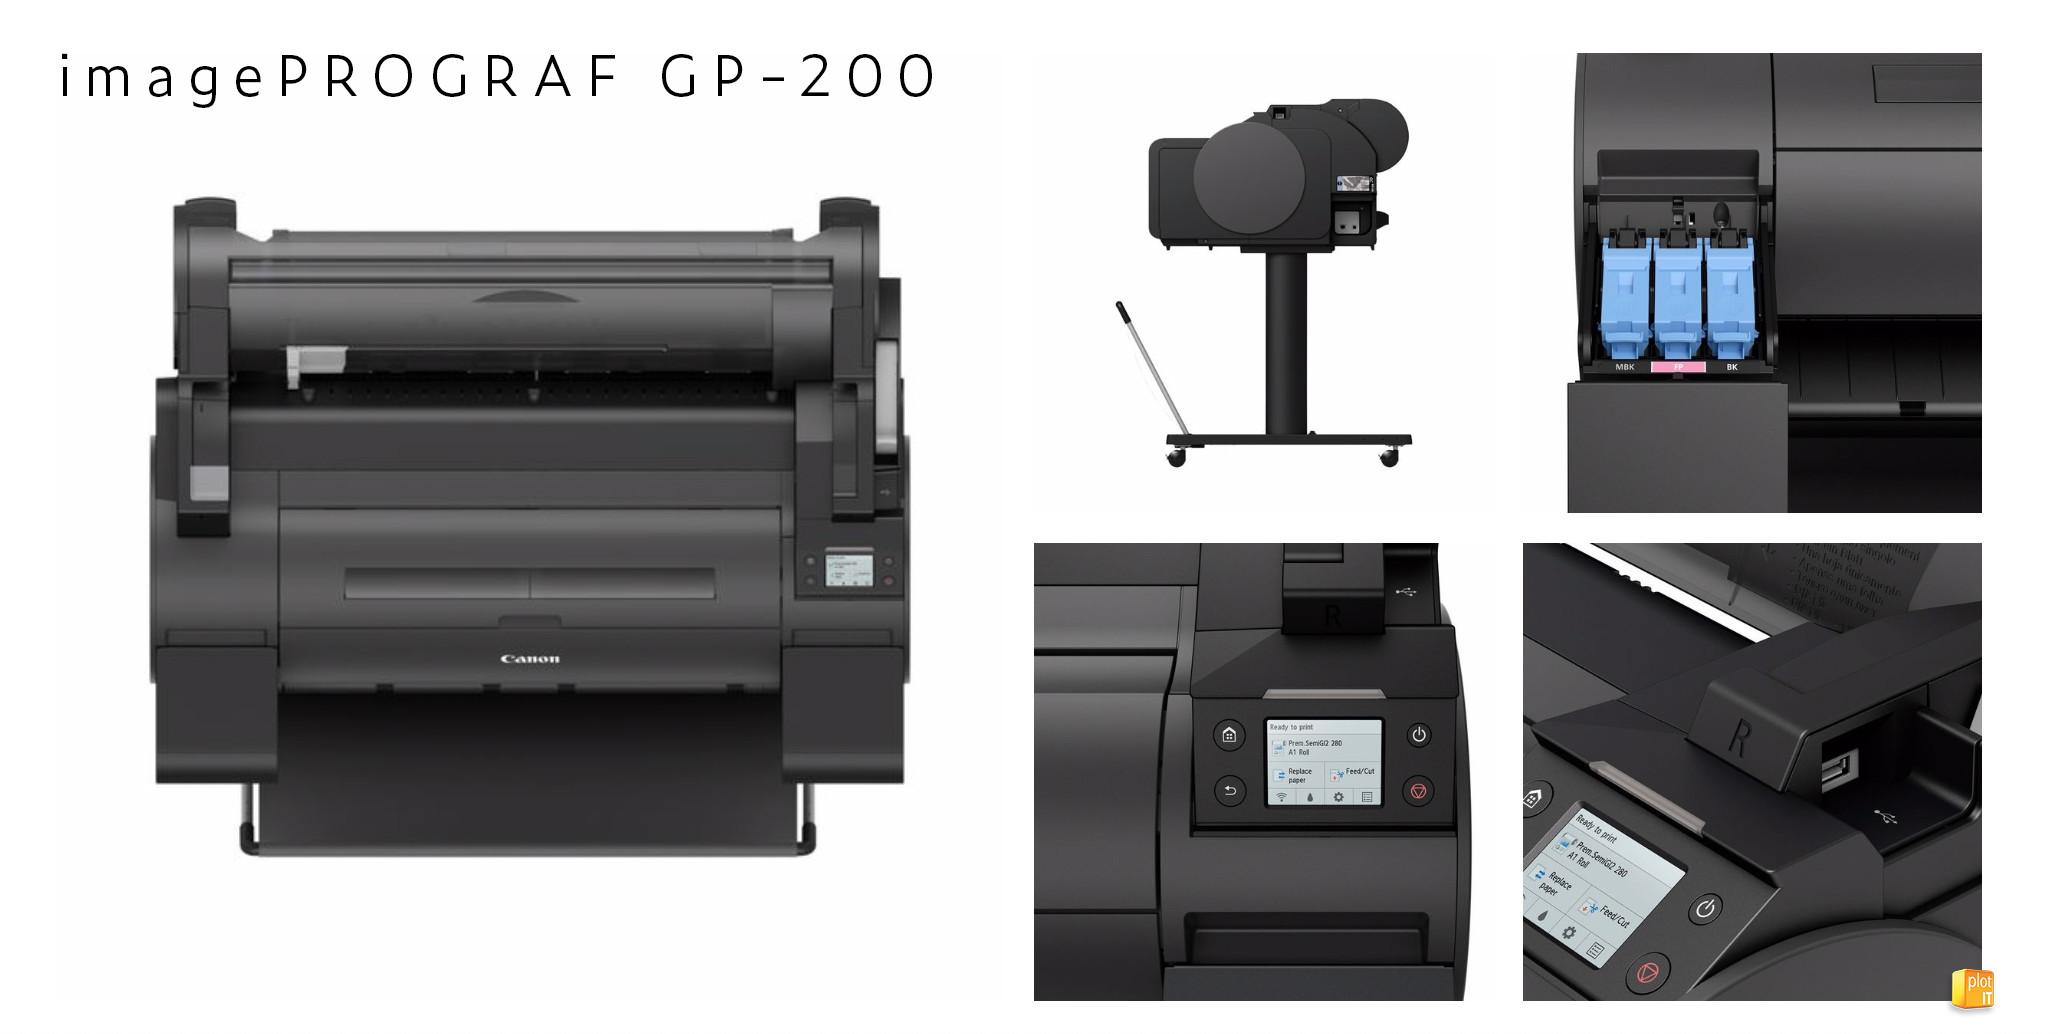 Canon imagePROGRAF GP-200 image collage